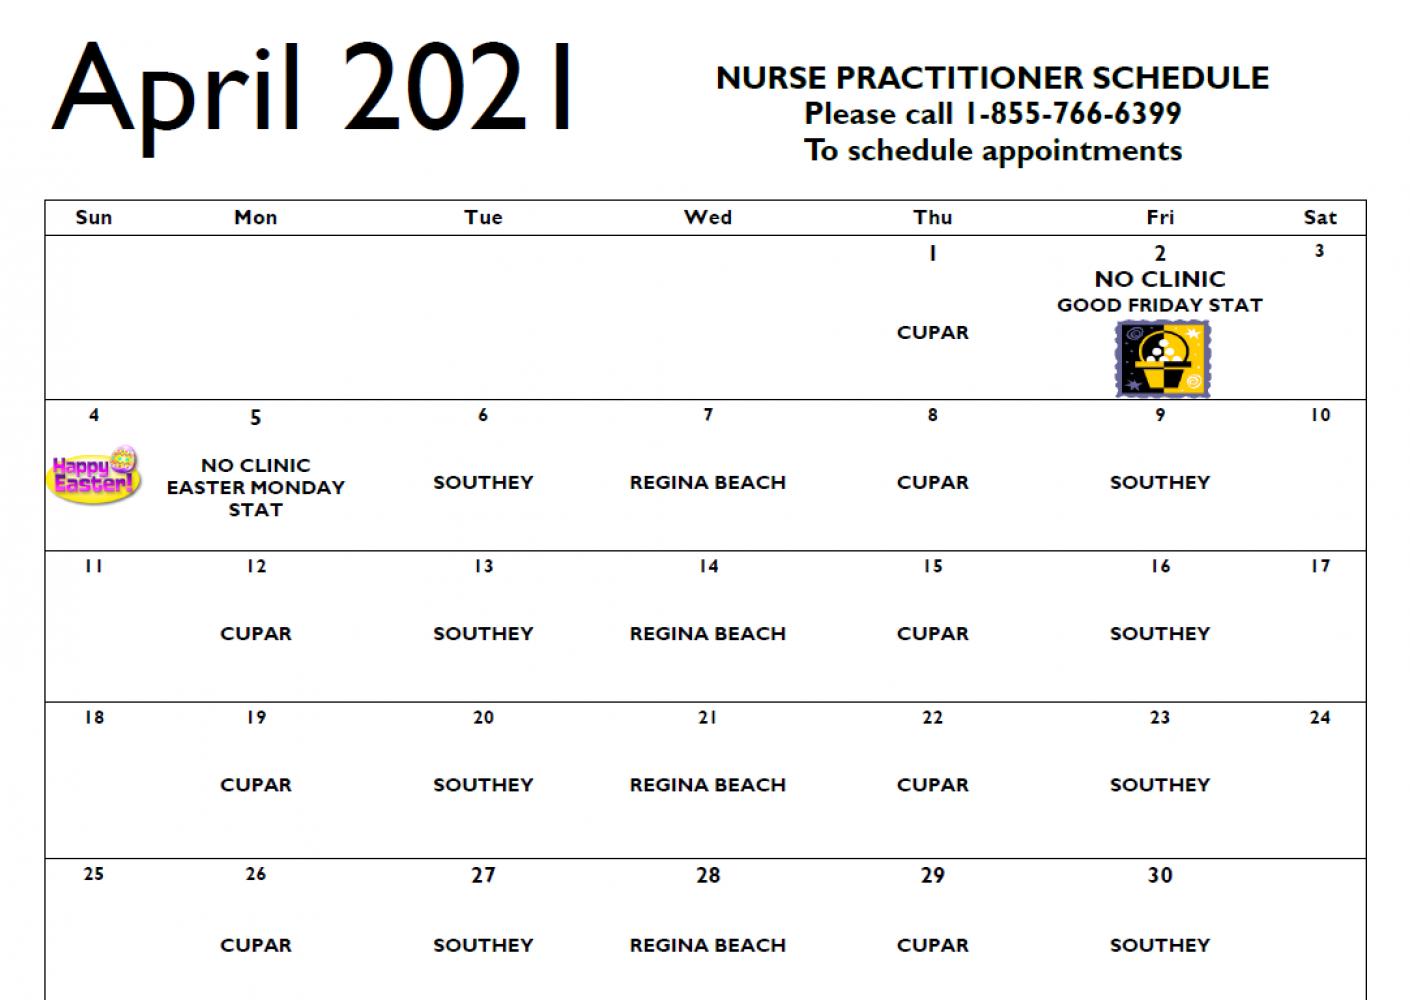 April Nurse Practitioner Schedule